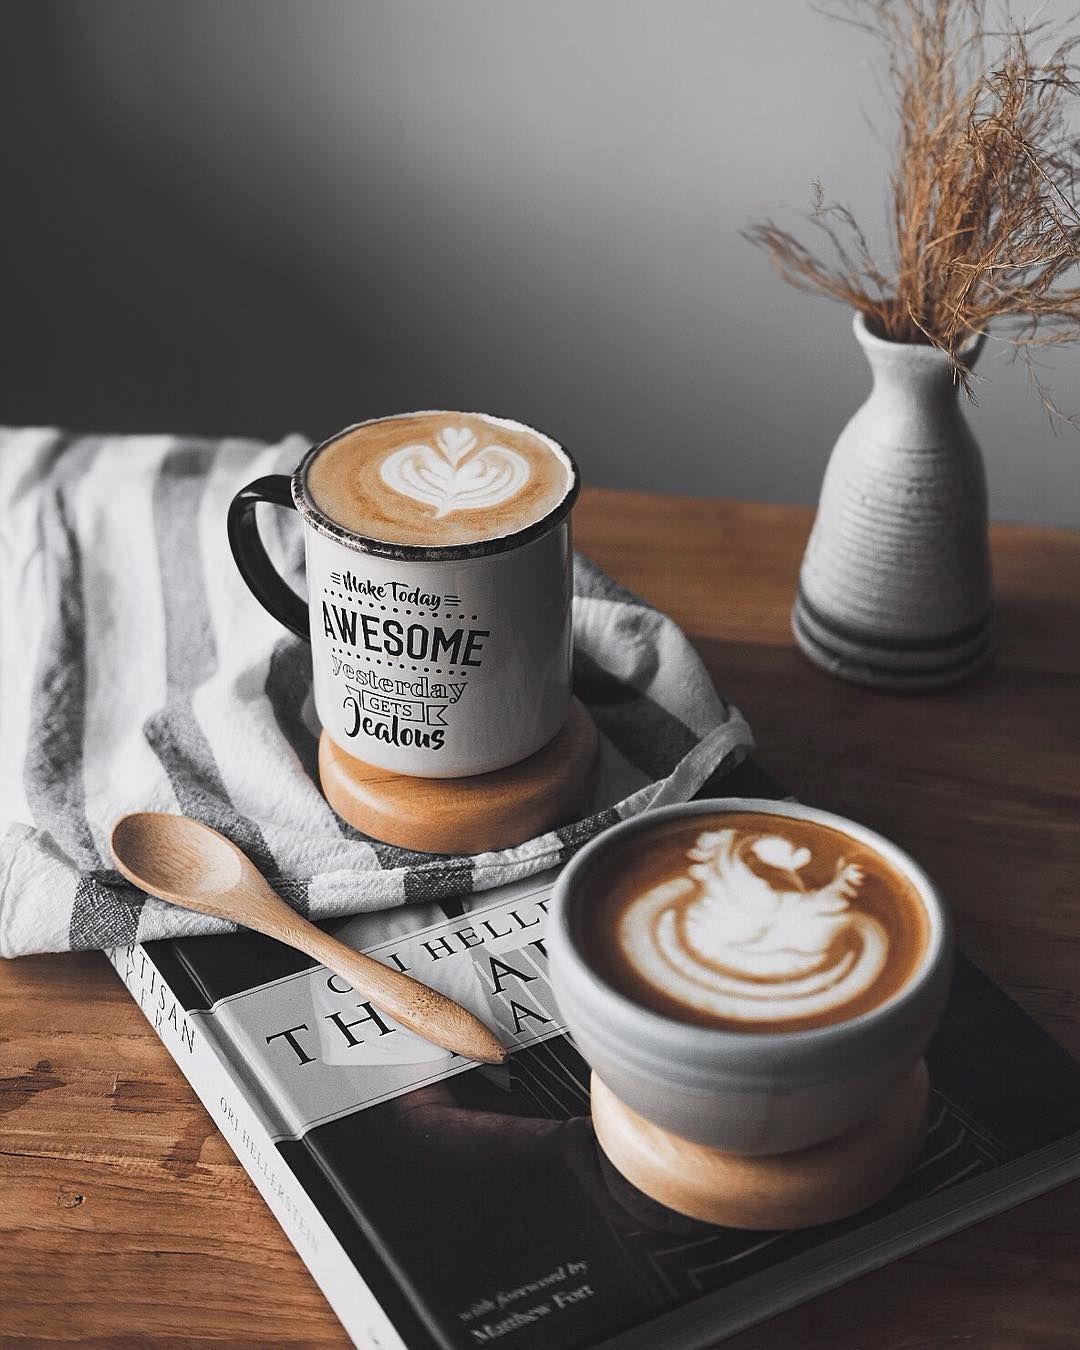 579 Otmetok Nravitsya 7 Kommentariev Nino Bernardus Chrisna Bybernardus V Instagram Banyak Yang Harus Di Syukuri Byb Breakfast Tea Coffee Cafe Food